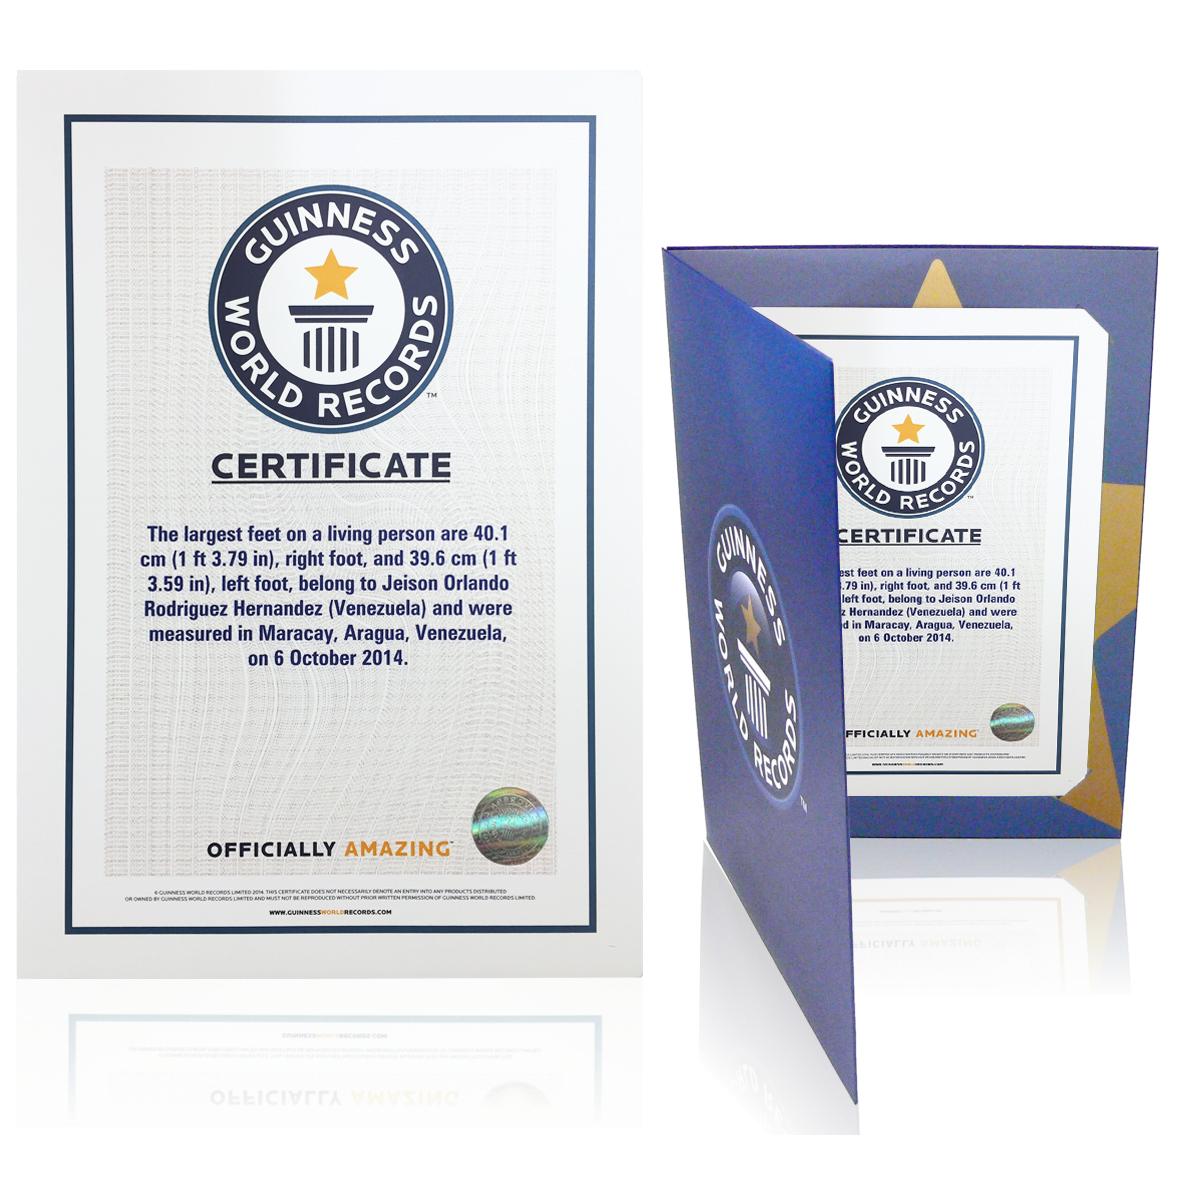 GWR certificates-image.jpg